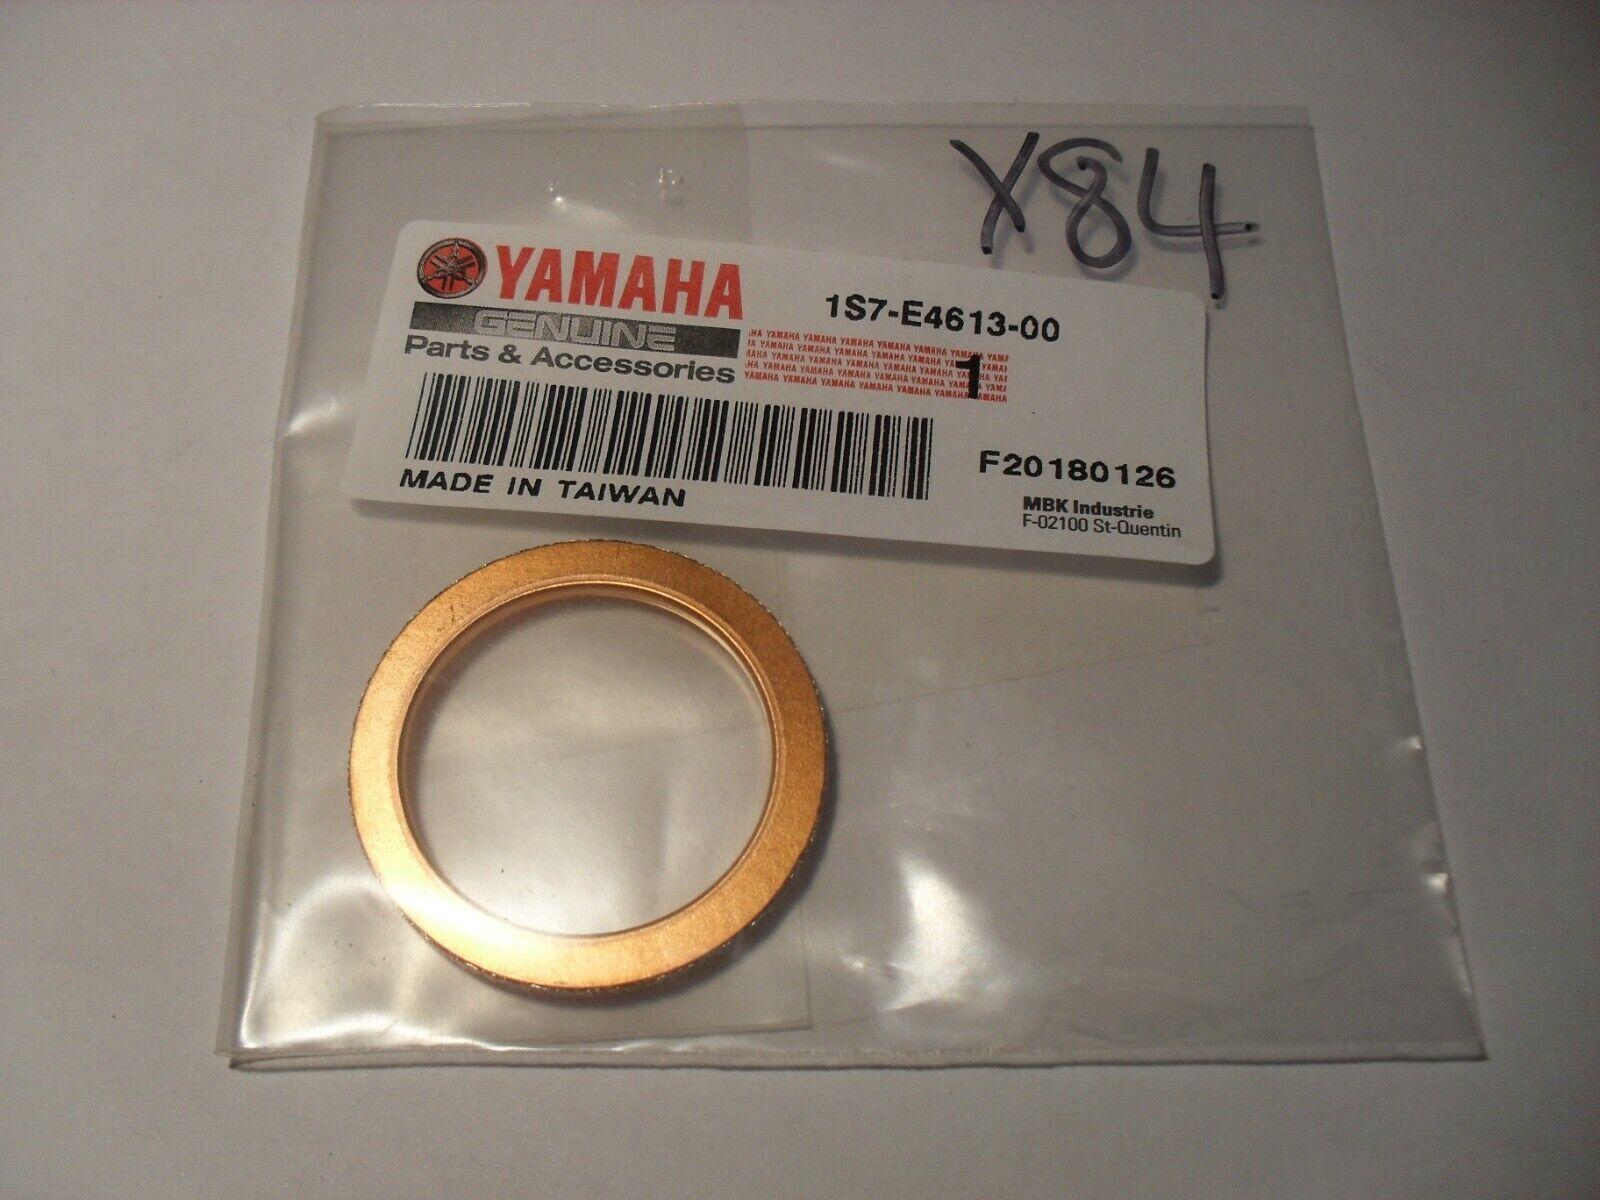 KR KRÜMMERDICHTUNG Exhaust gasket YAMAHA YZF-R 125 14-15